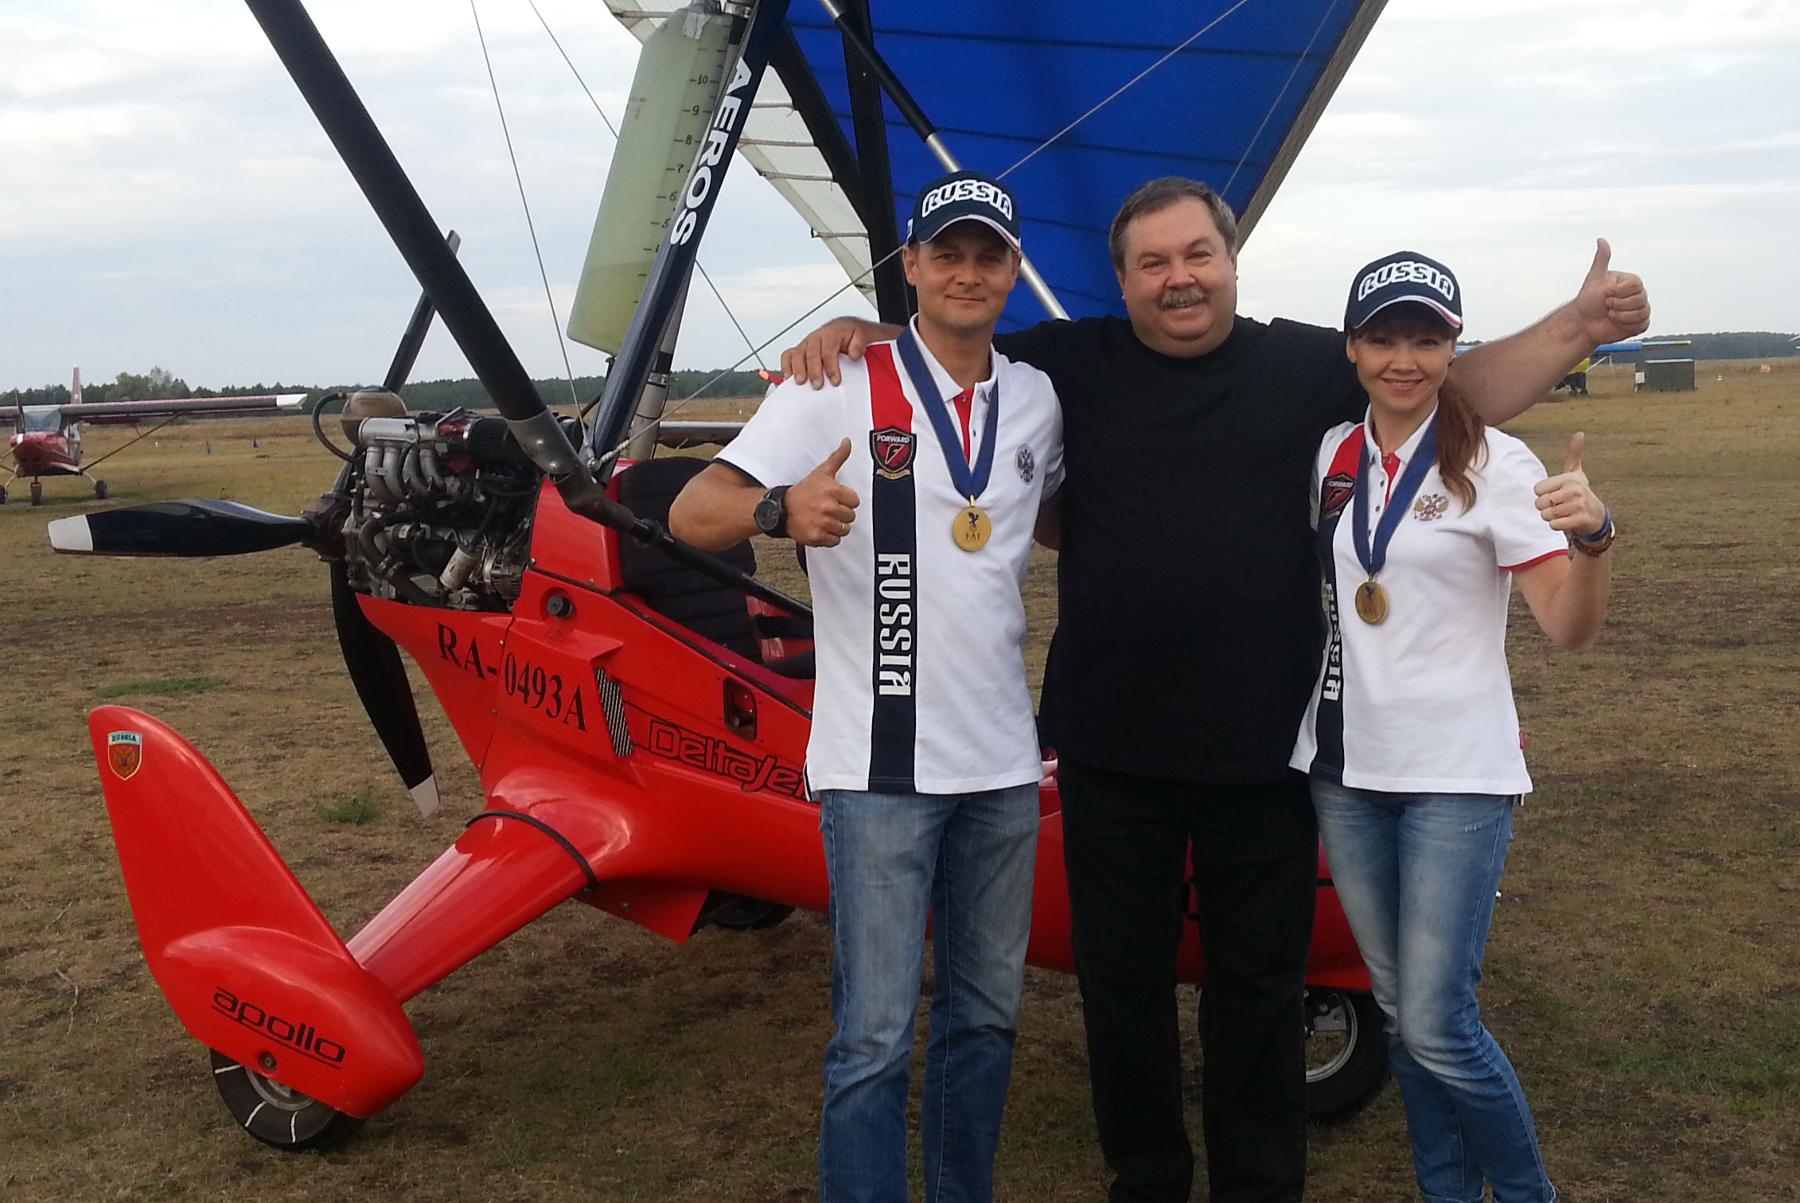 Air Trikes Enterprises